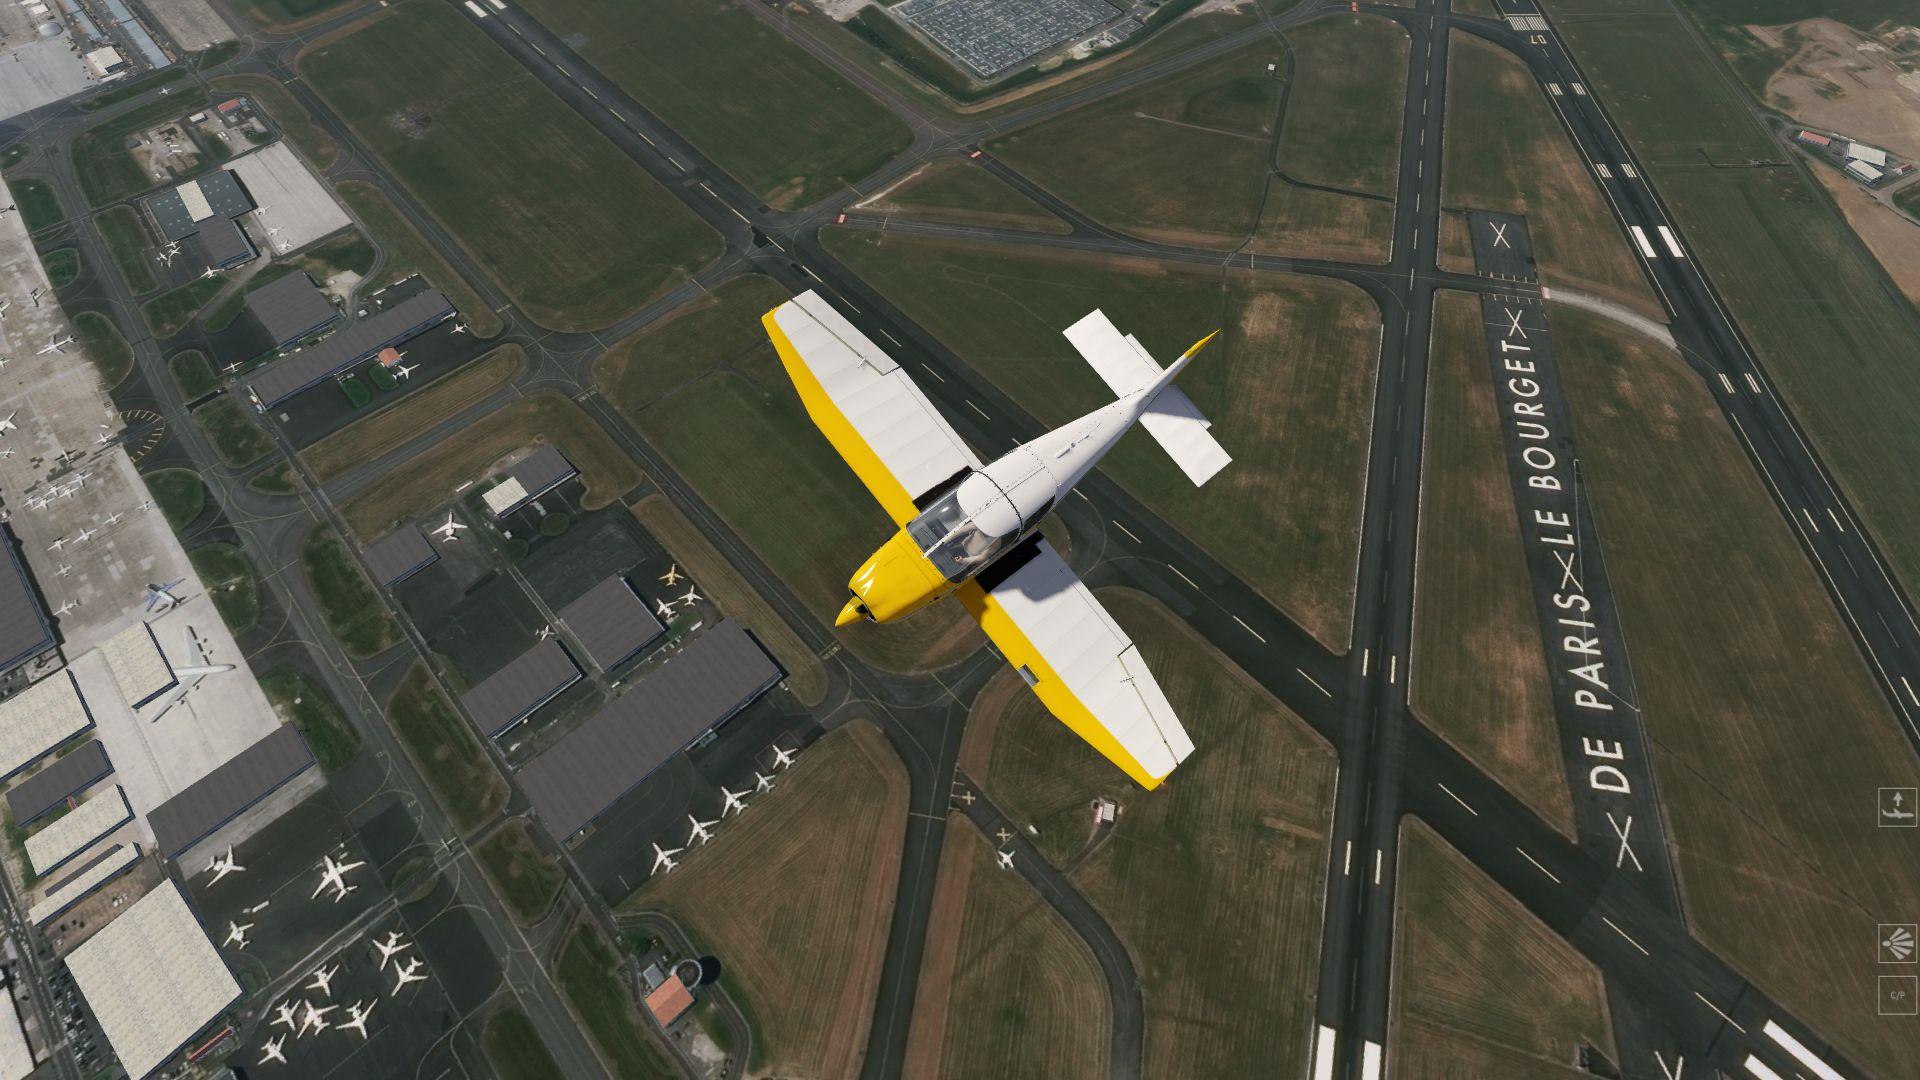 http://www.pilote-virtuel.com/img/gallery/1517233066.jpg